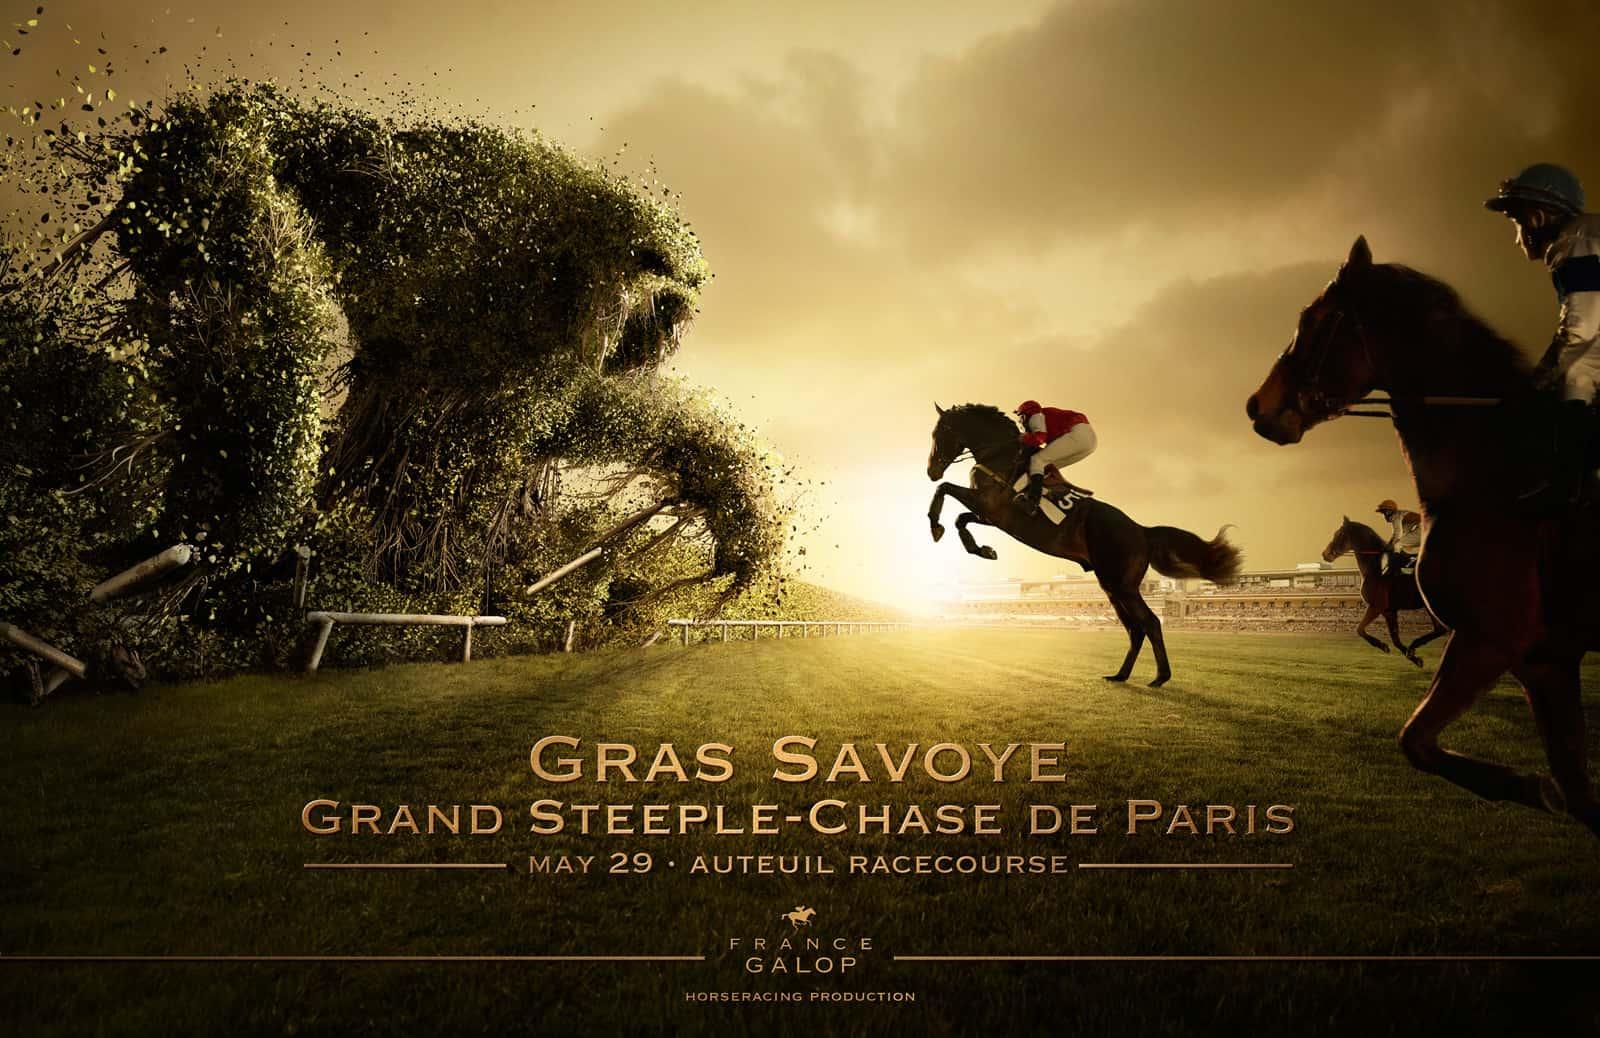 France Galop : Monstre